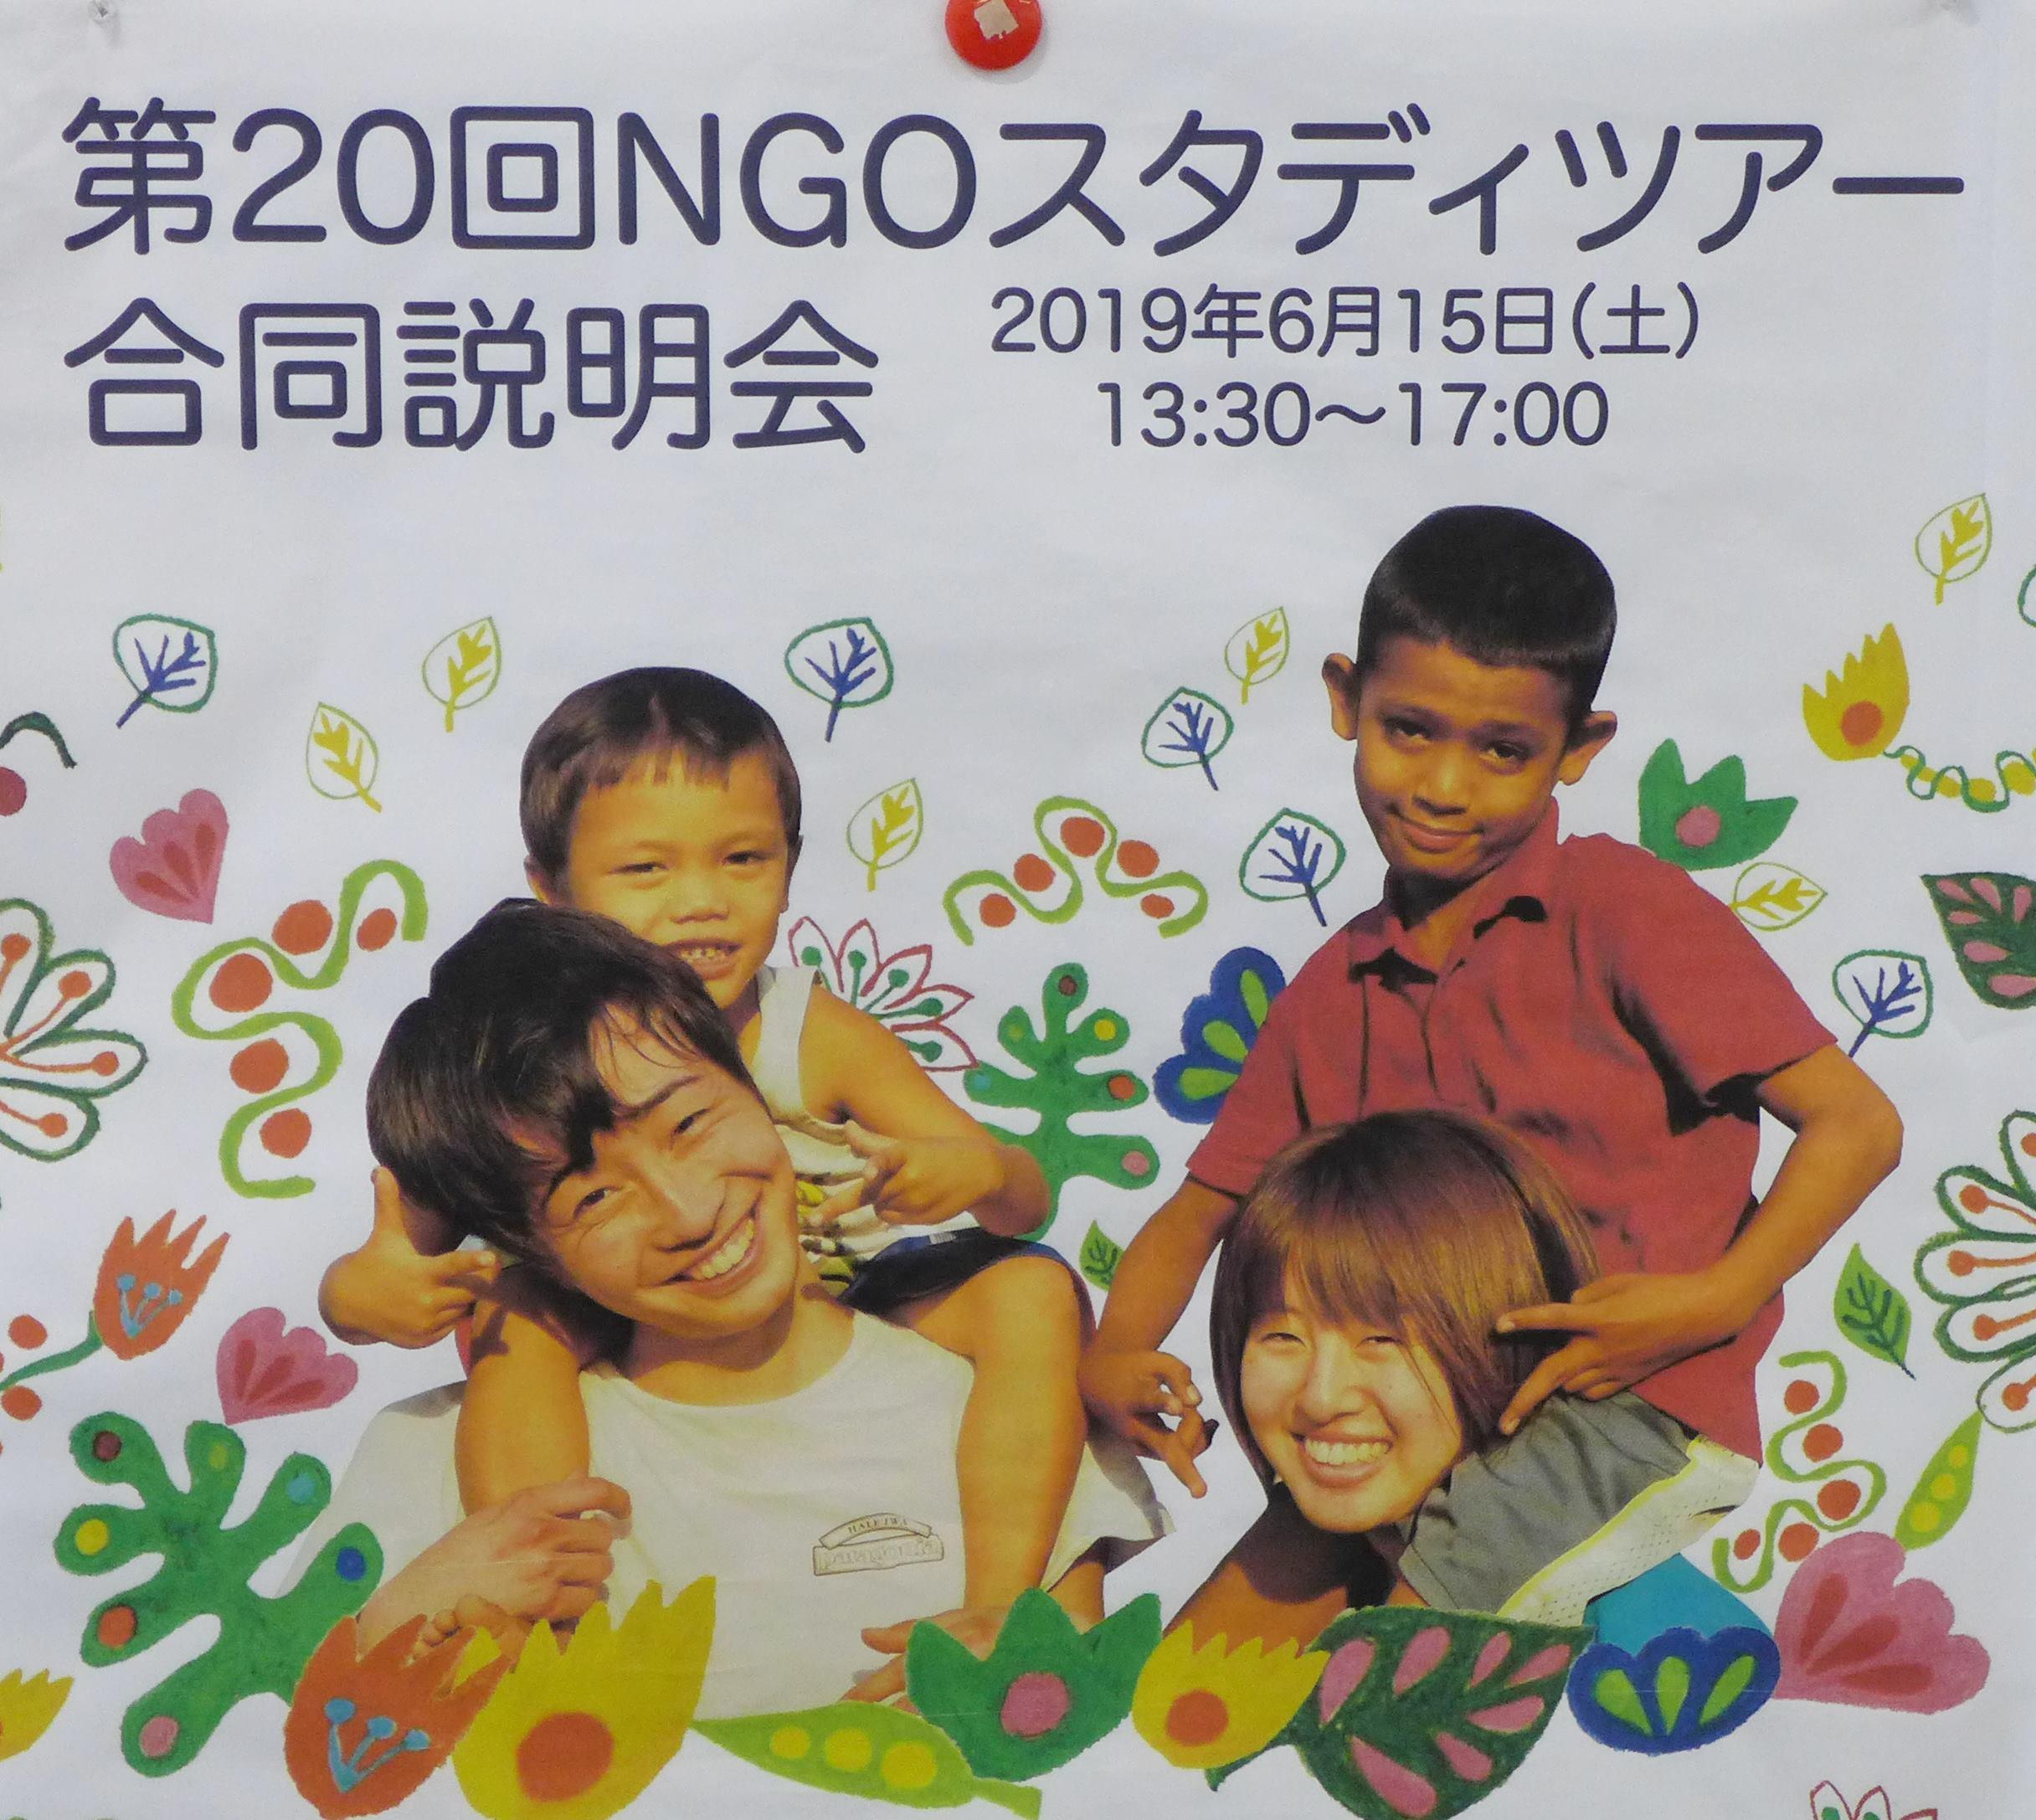 NGOスタディツアー合同説明会【マイチケット】